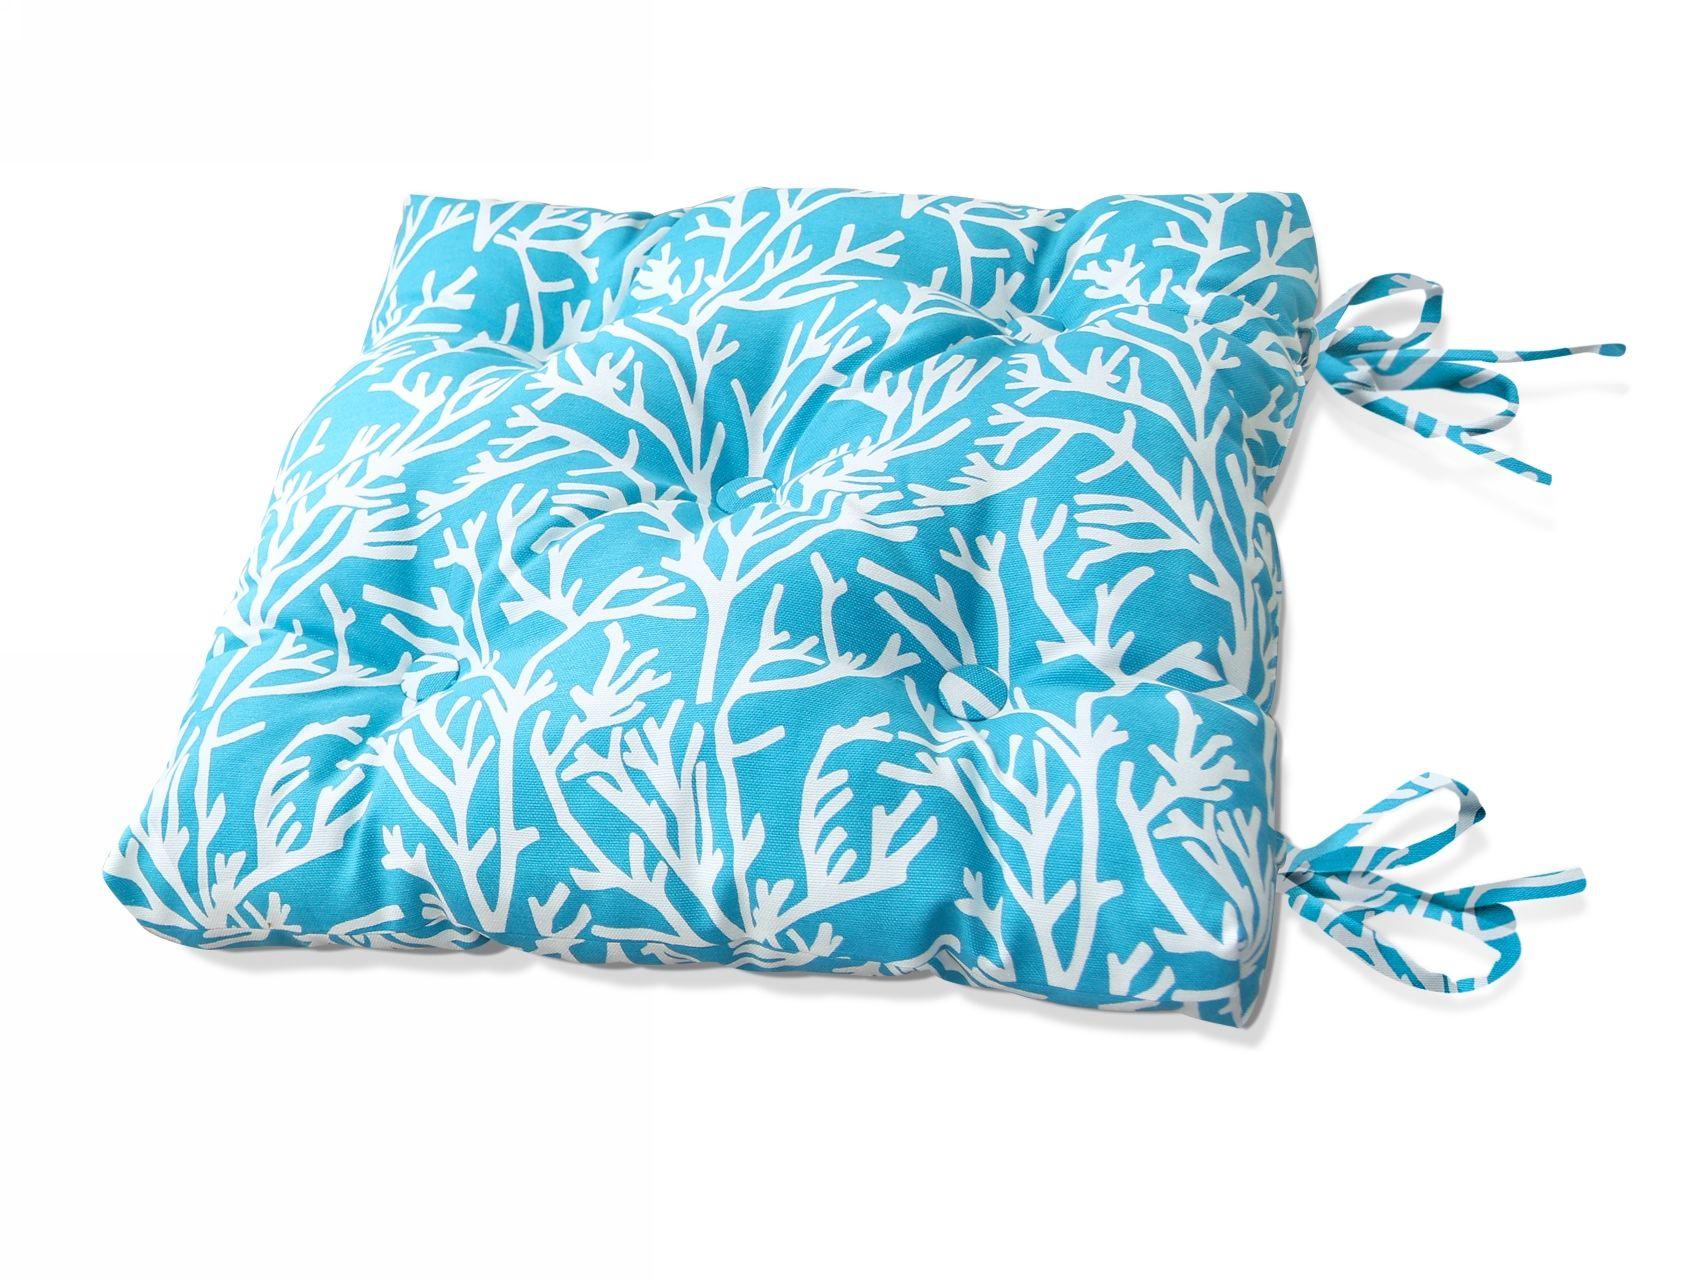 Подушки на стул Kauffort Подушка на стул Corals Цвет: Небесно-Голубой (40х40) подушка на стул адмирал цвет голубой синий 40 х 40 см